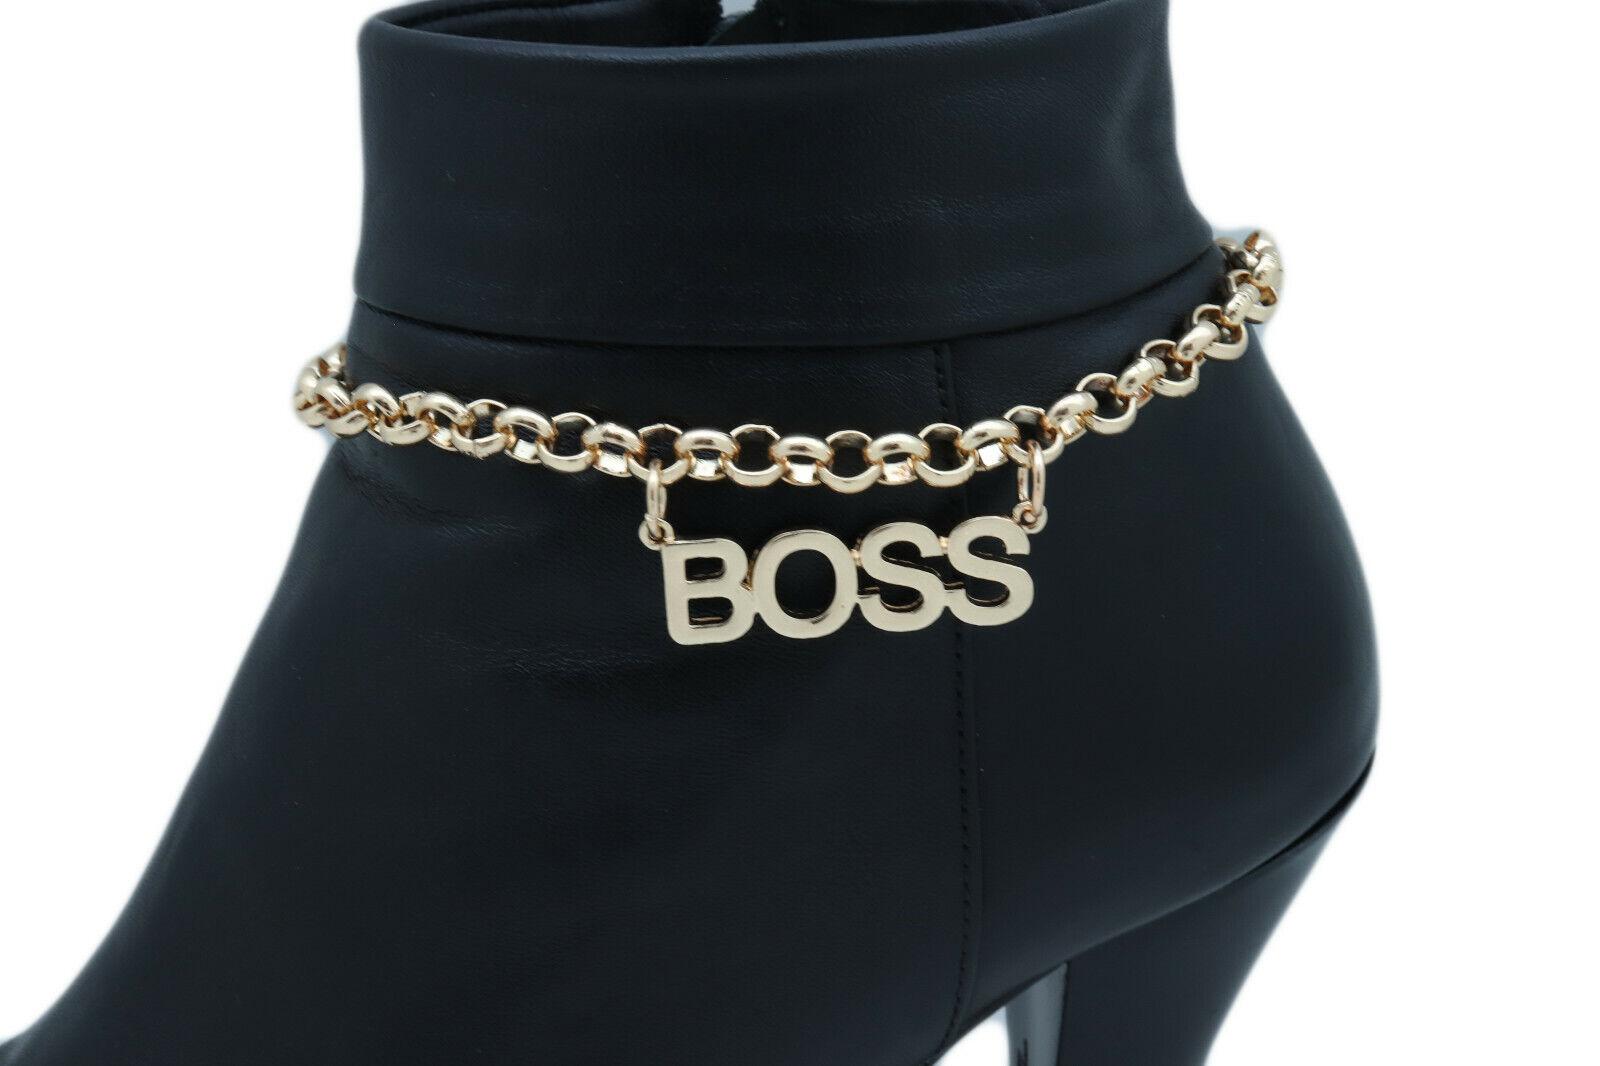 Women Gold Metal Chain Boot Bracelet Shoe Anklet BOSS Charm Gangster Cool Look